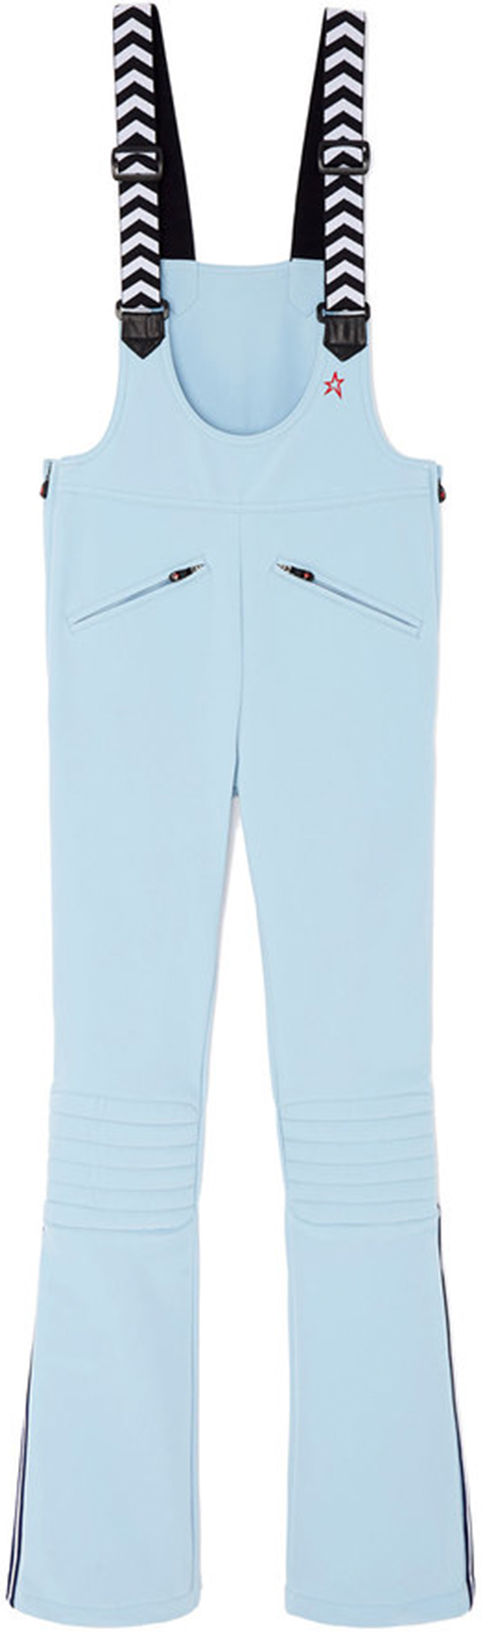 PERFECT MOMENT pants